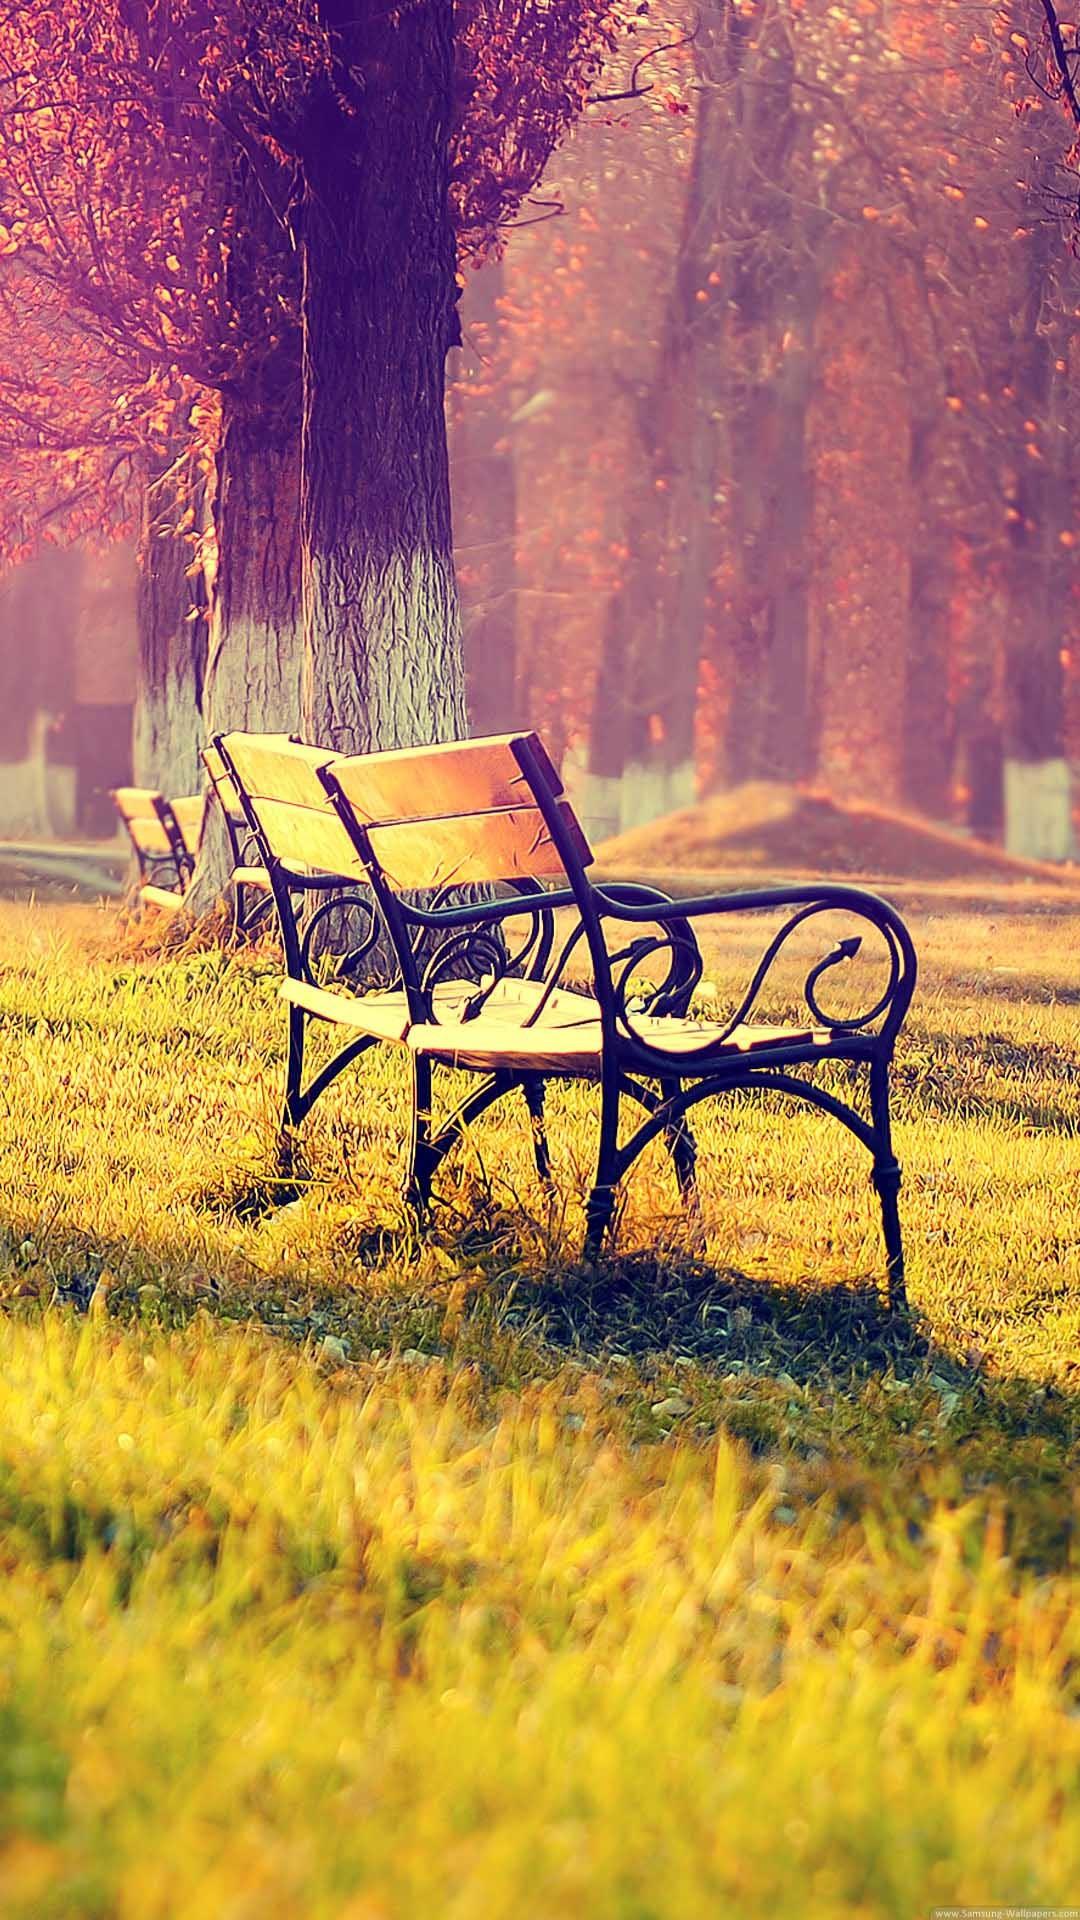 Bench In The Park Autumn Landscape iPhone 6 Plus HD Wallpaper